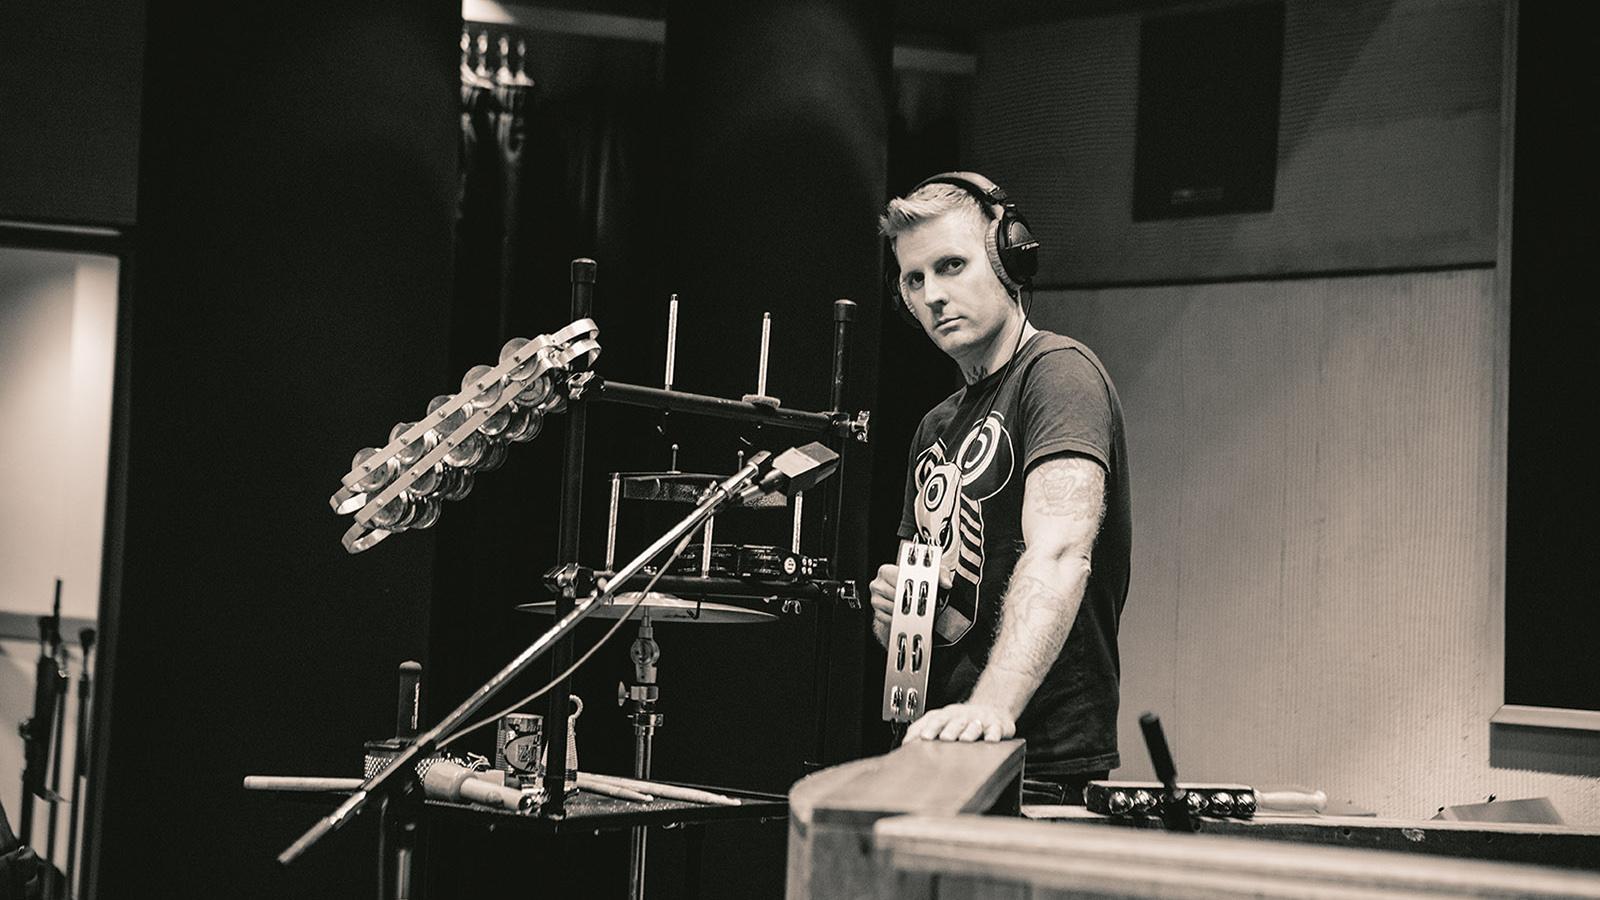 Mastodon's Brann Dailor Talks Tool's Influence, Hilarious Tour Pranks